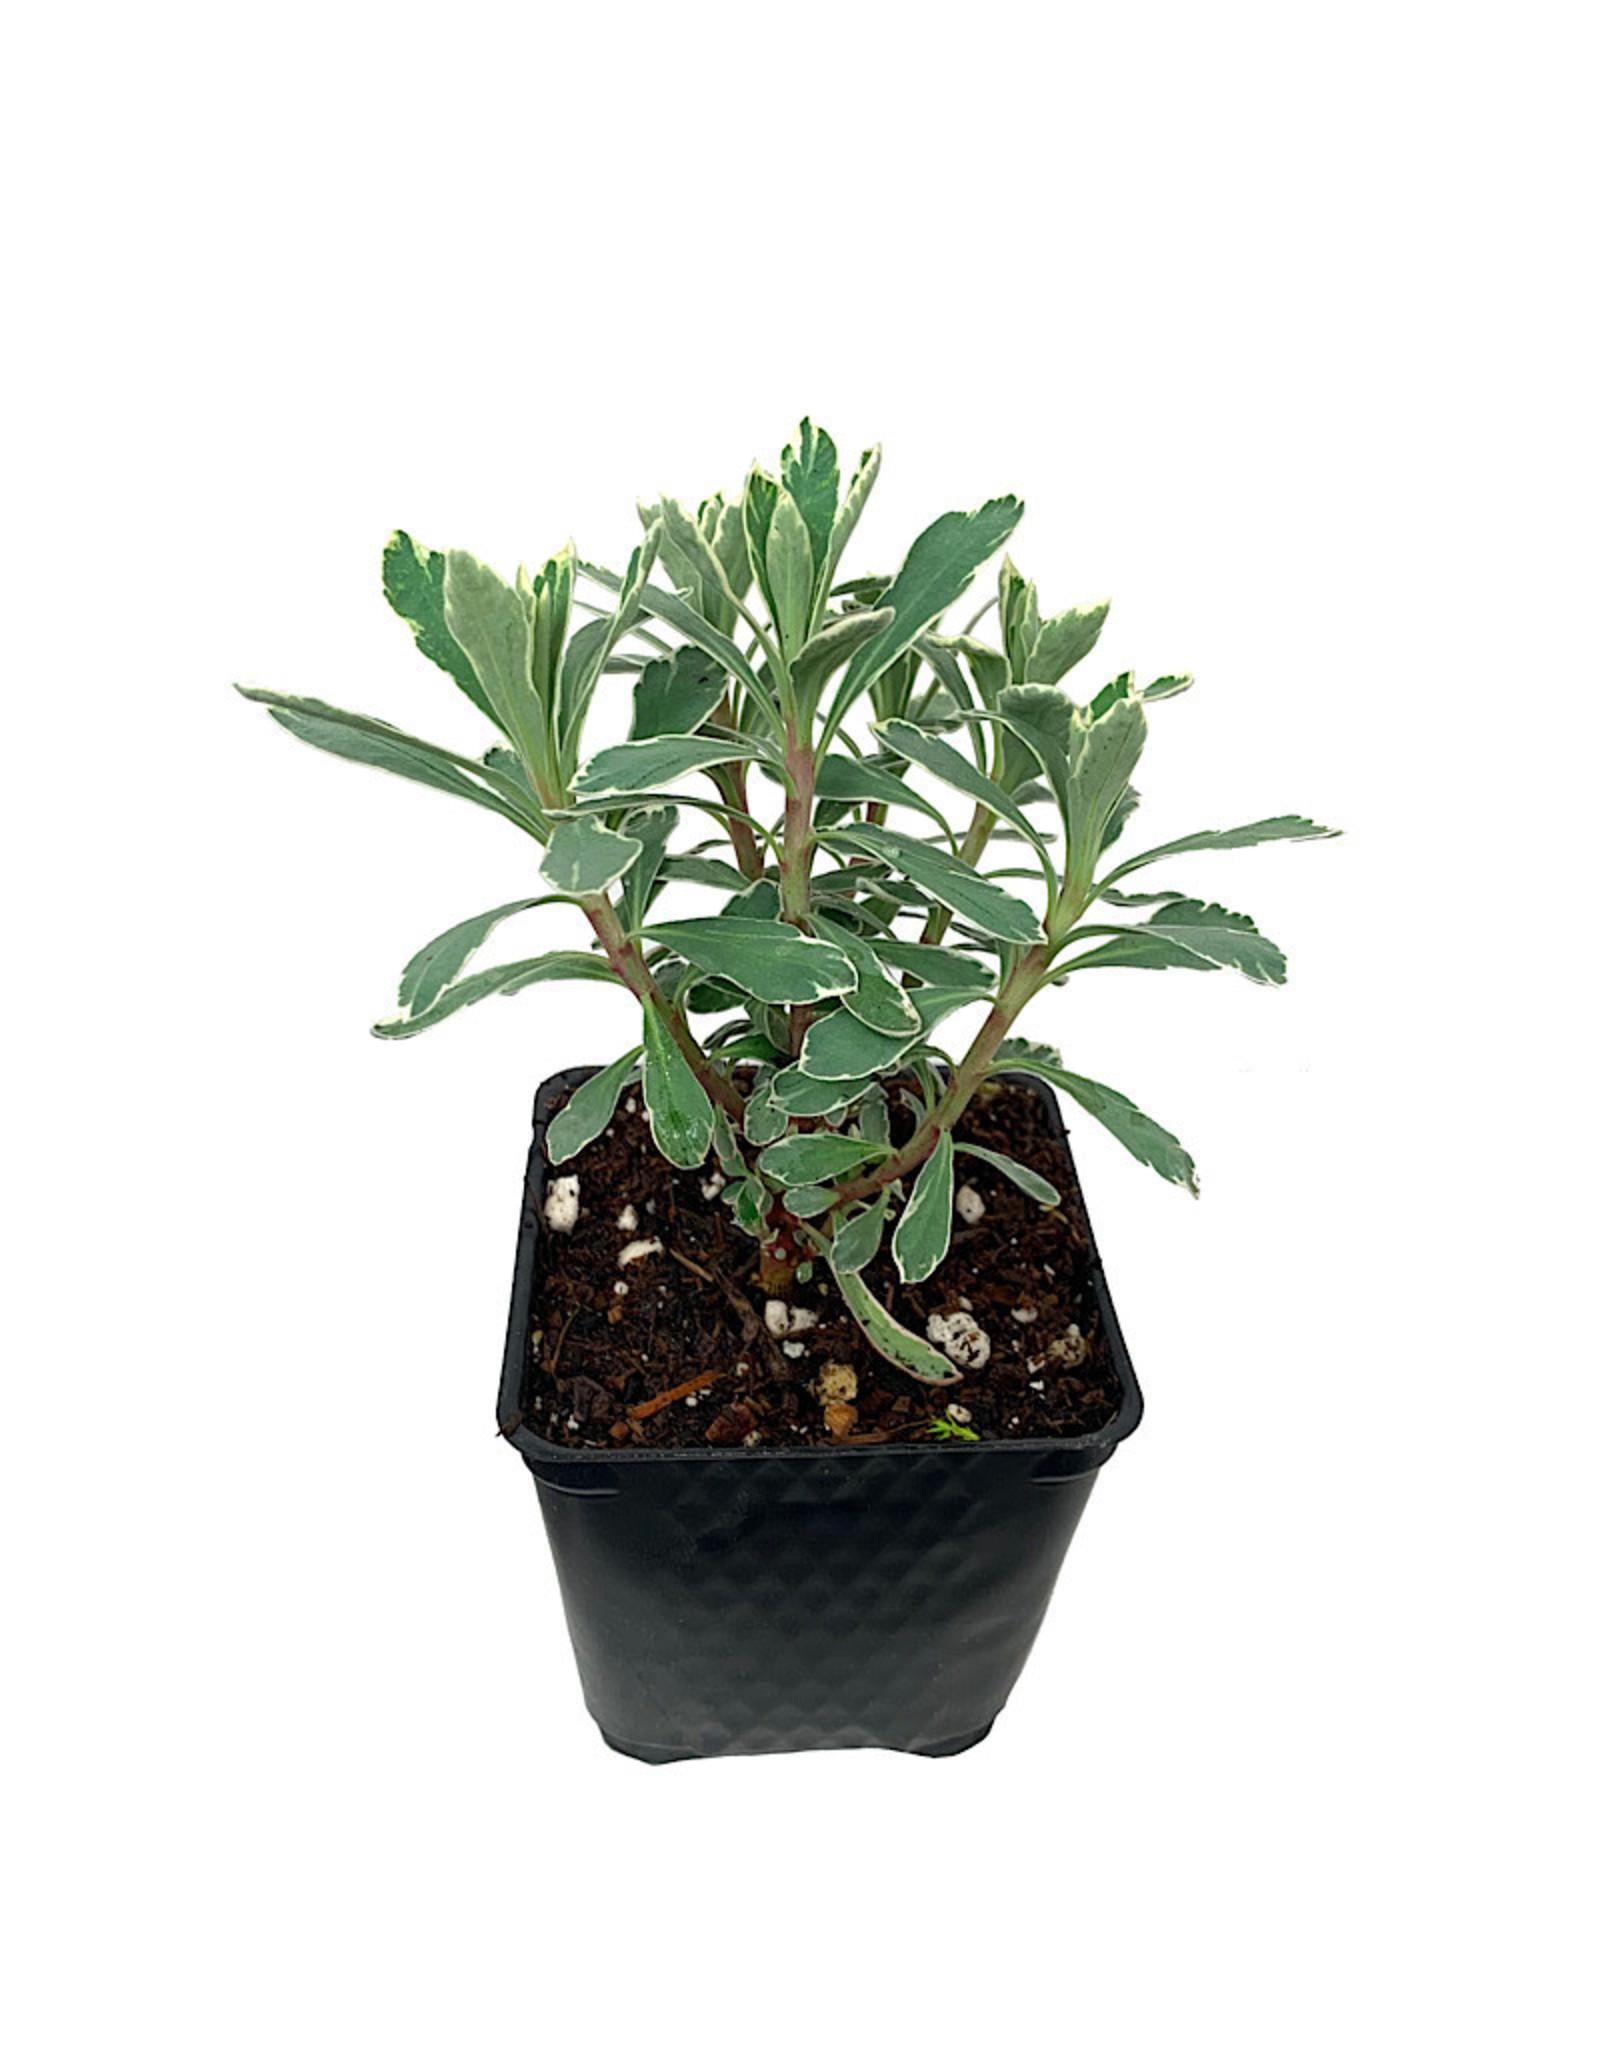 Euphorbia 'Silver Swan' 4 Inch